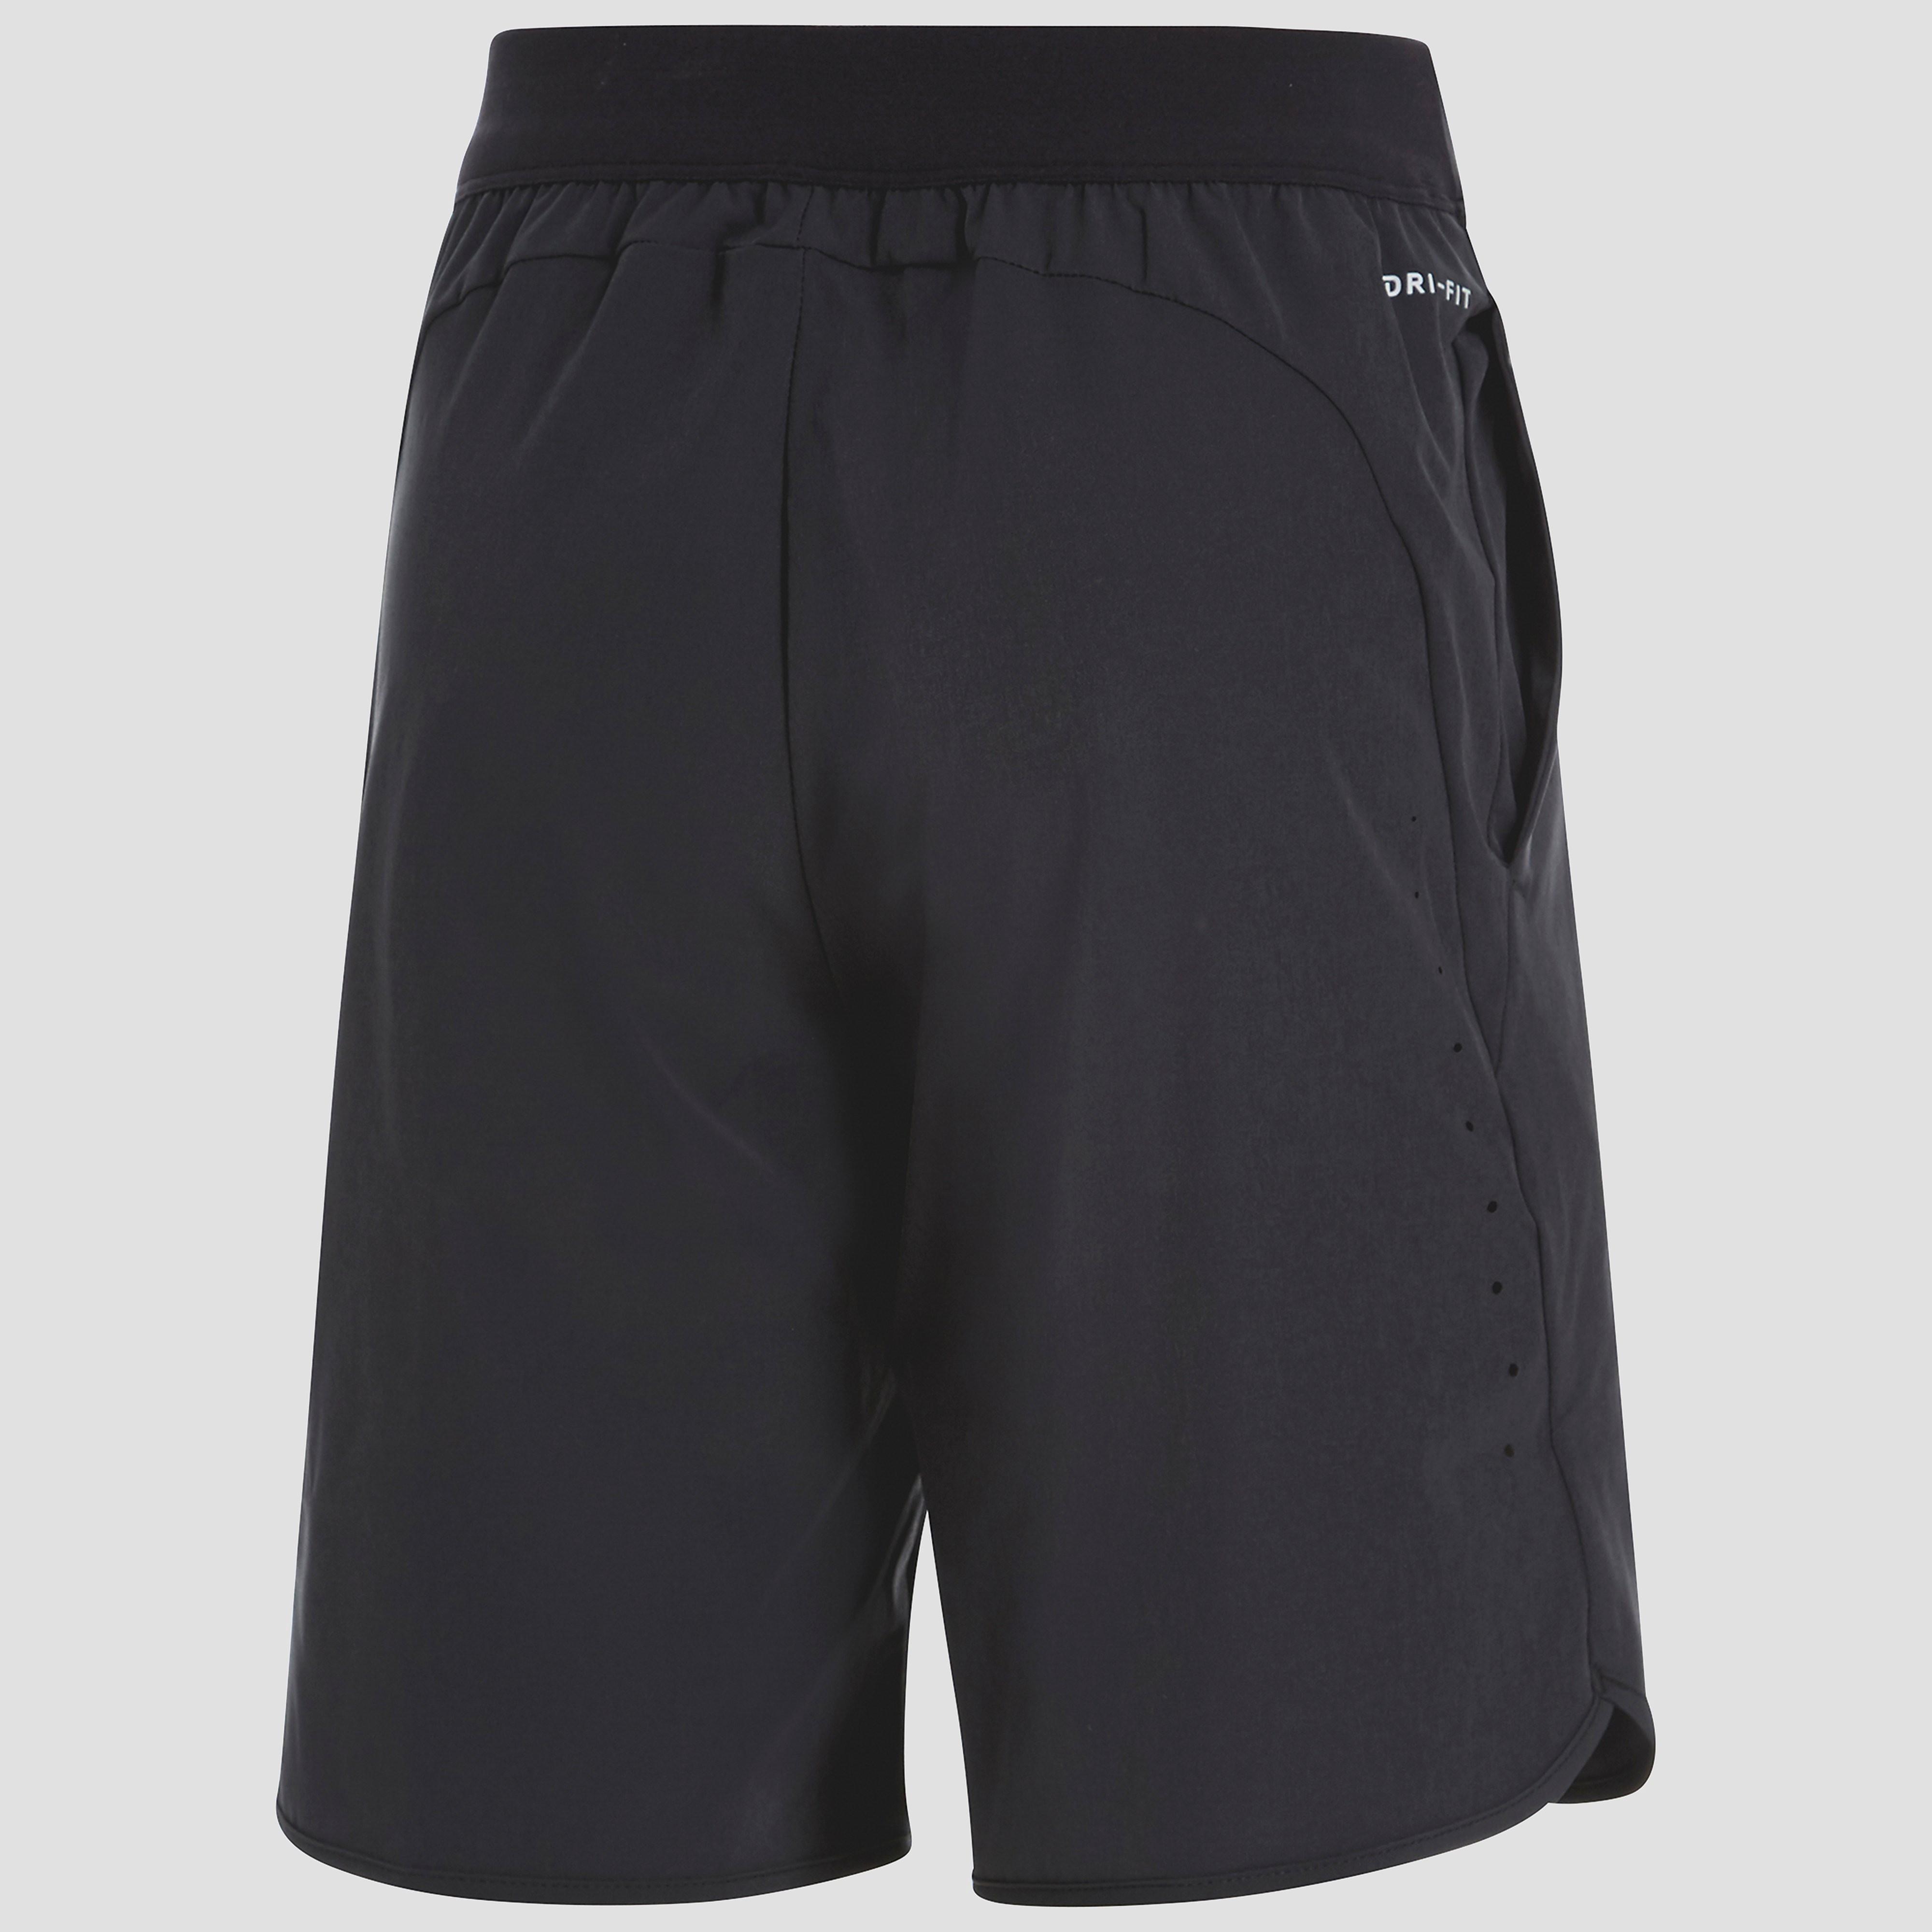 Nike Fall Flex Ace Junior Tennis Shorts